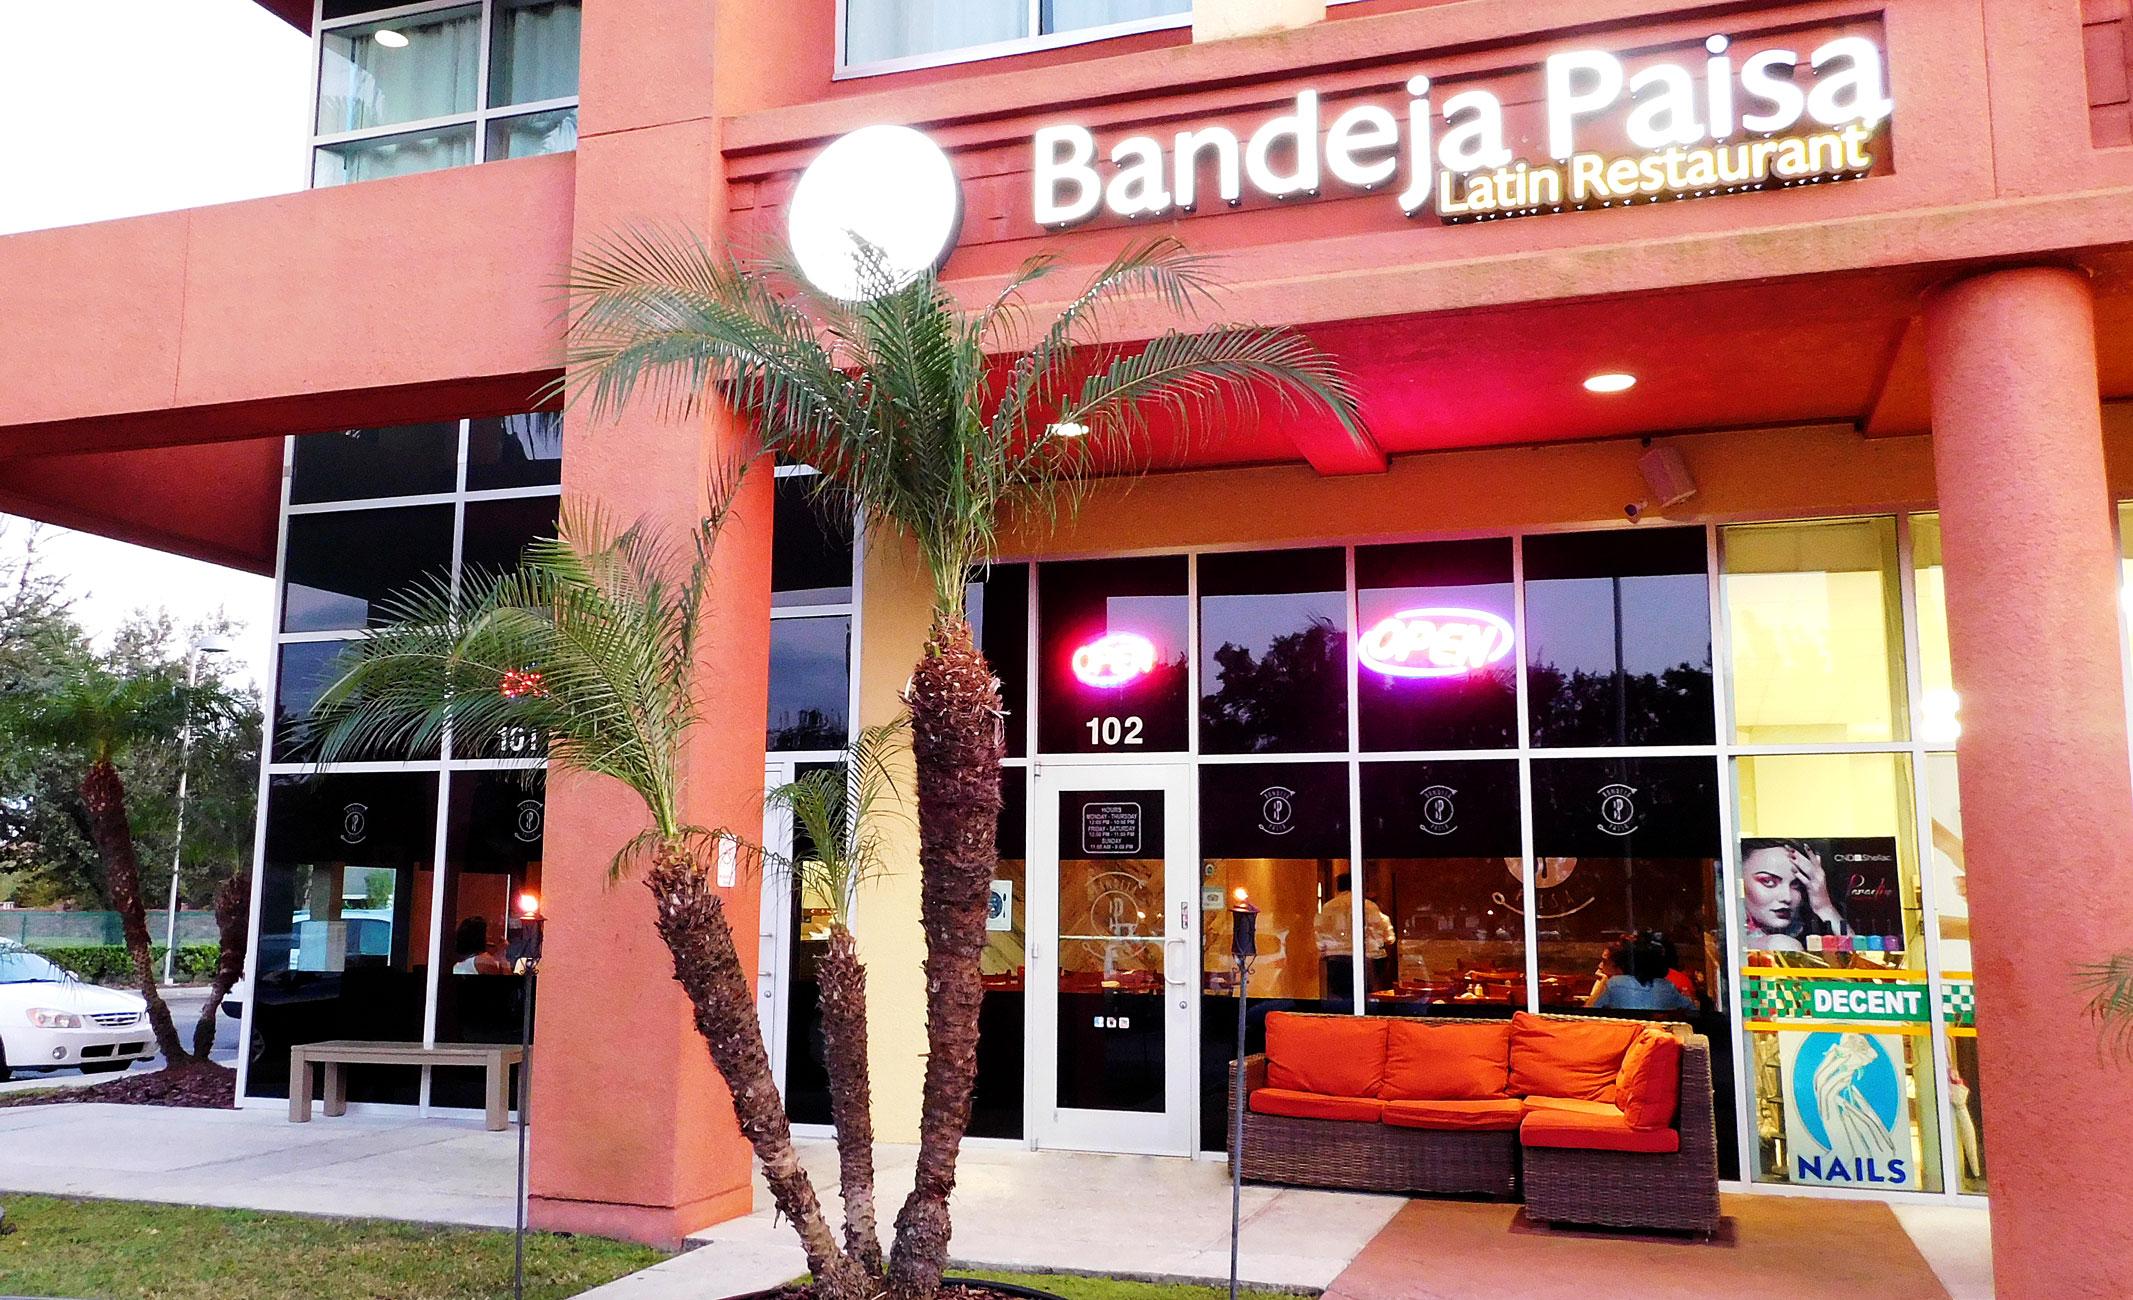 Bandeja_exterior11a.jpg